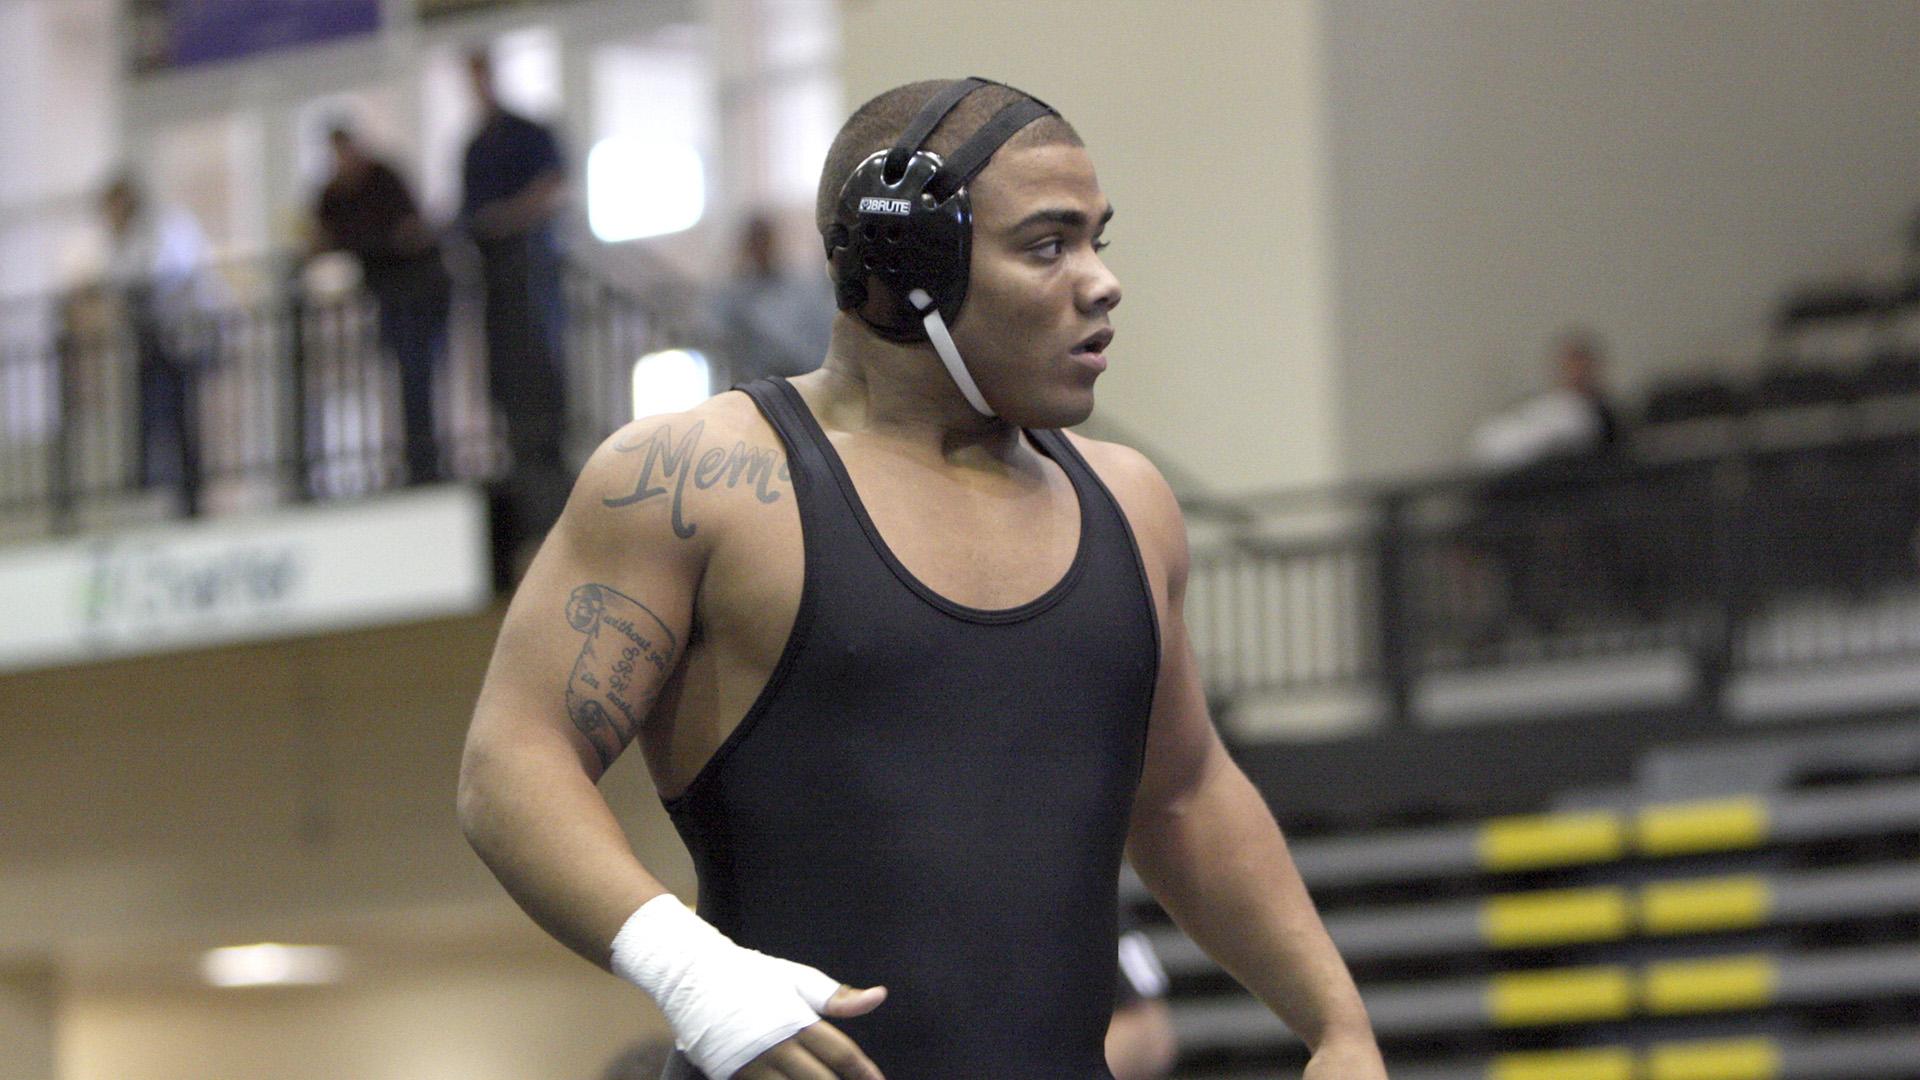 Deron Winn wrestles for Lindenwood University (photo credit: Don Adams Jr.)